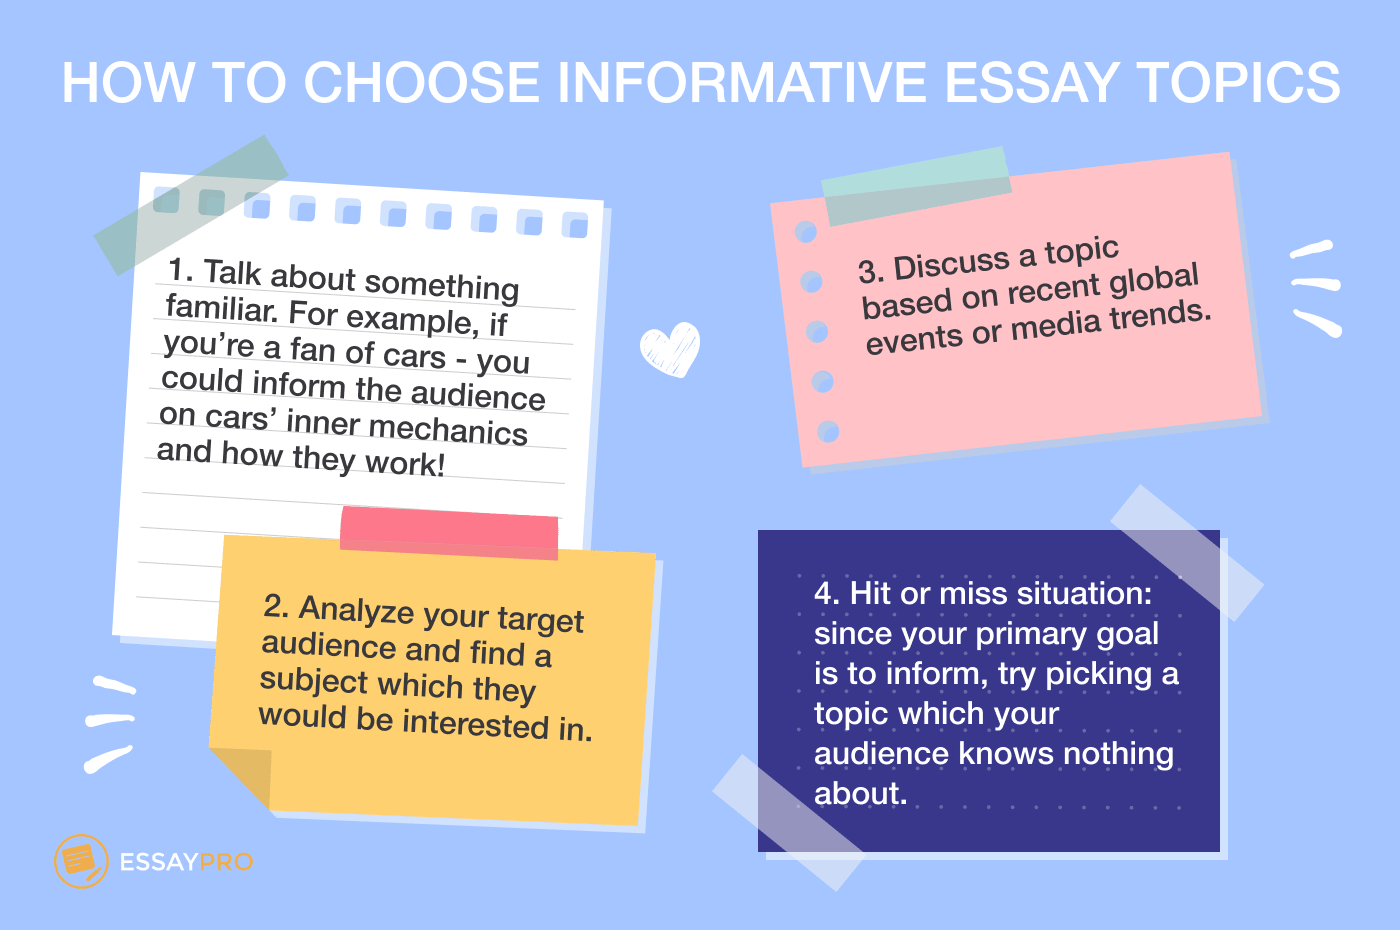 How-to-Choose-Informative-Essay-Topics